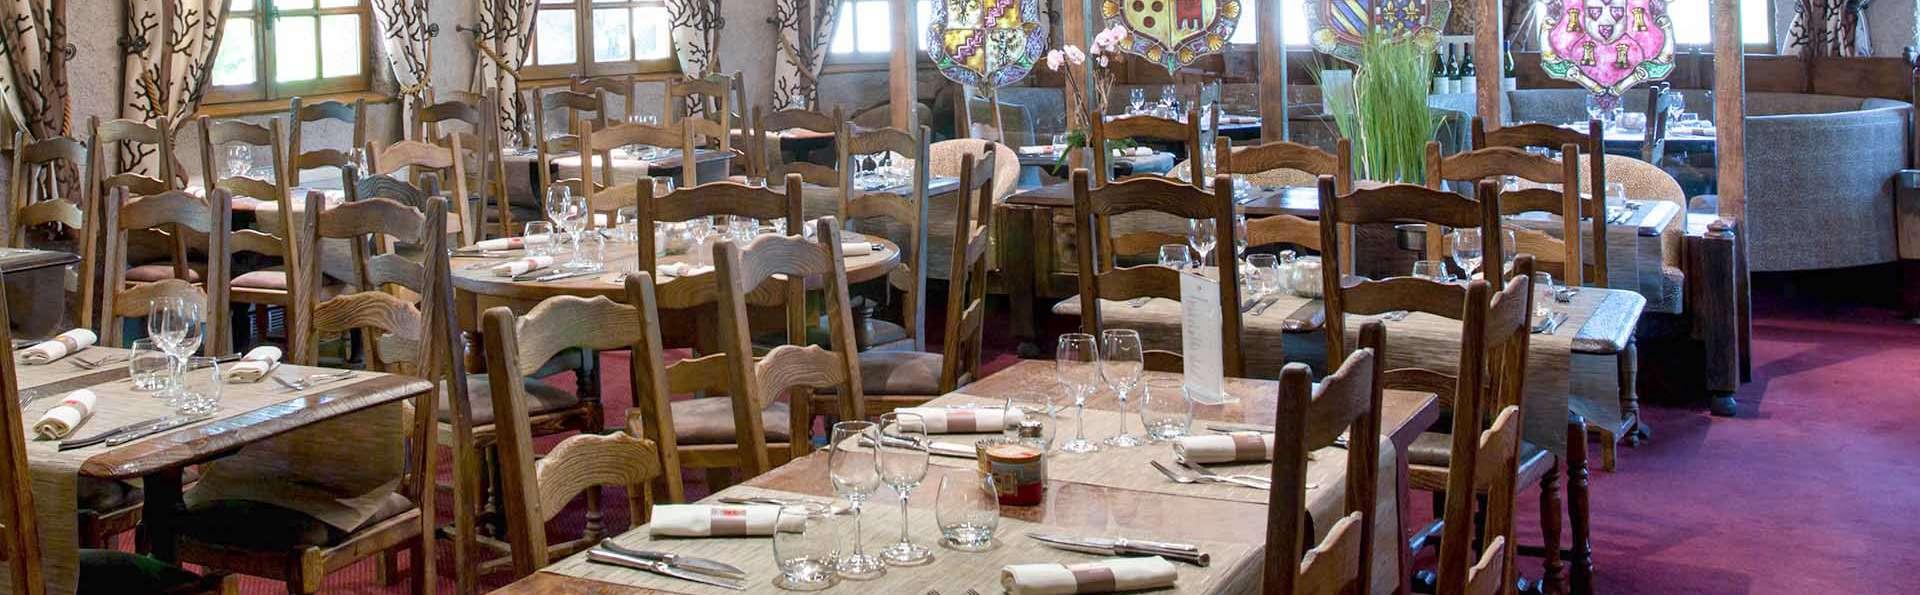 Week-end avec dîner près de Dijon